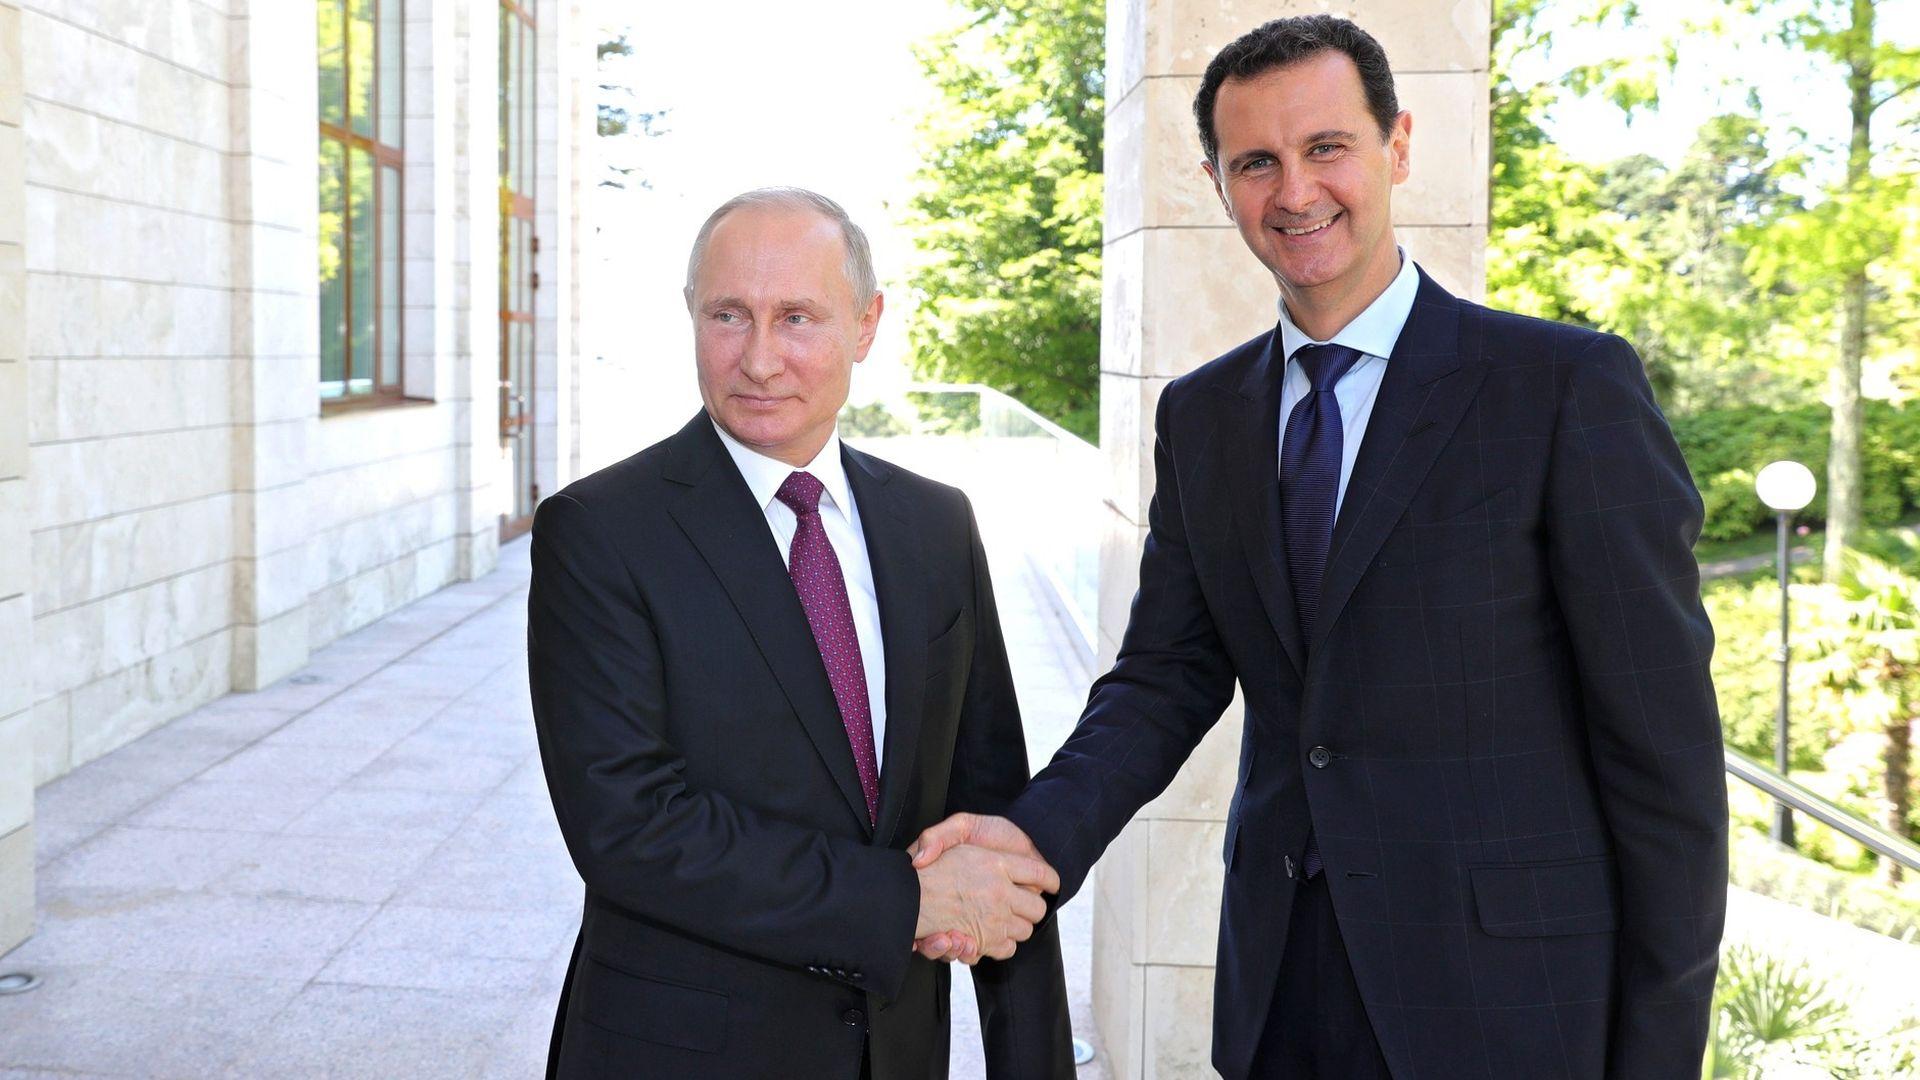 Vladimir Putin and Bashar al-Assad shaking hands and smiling